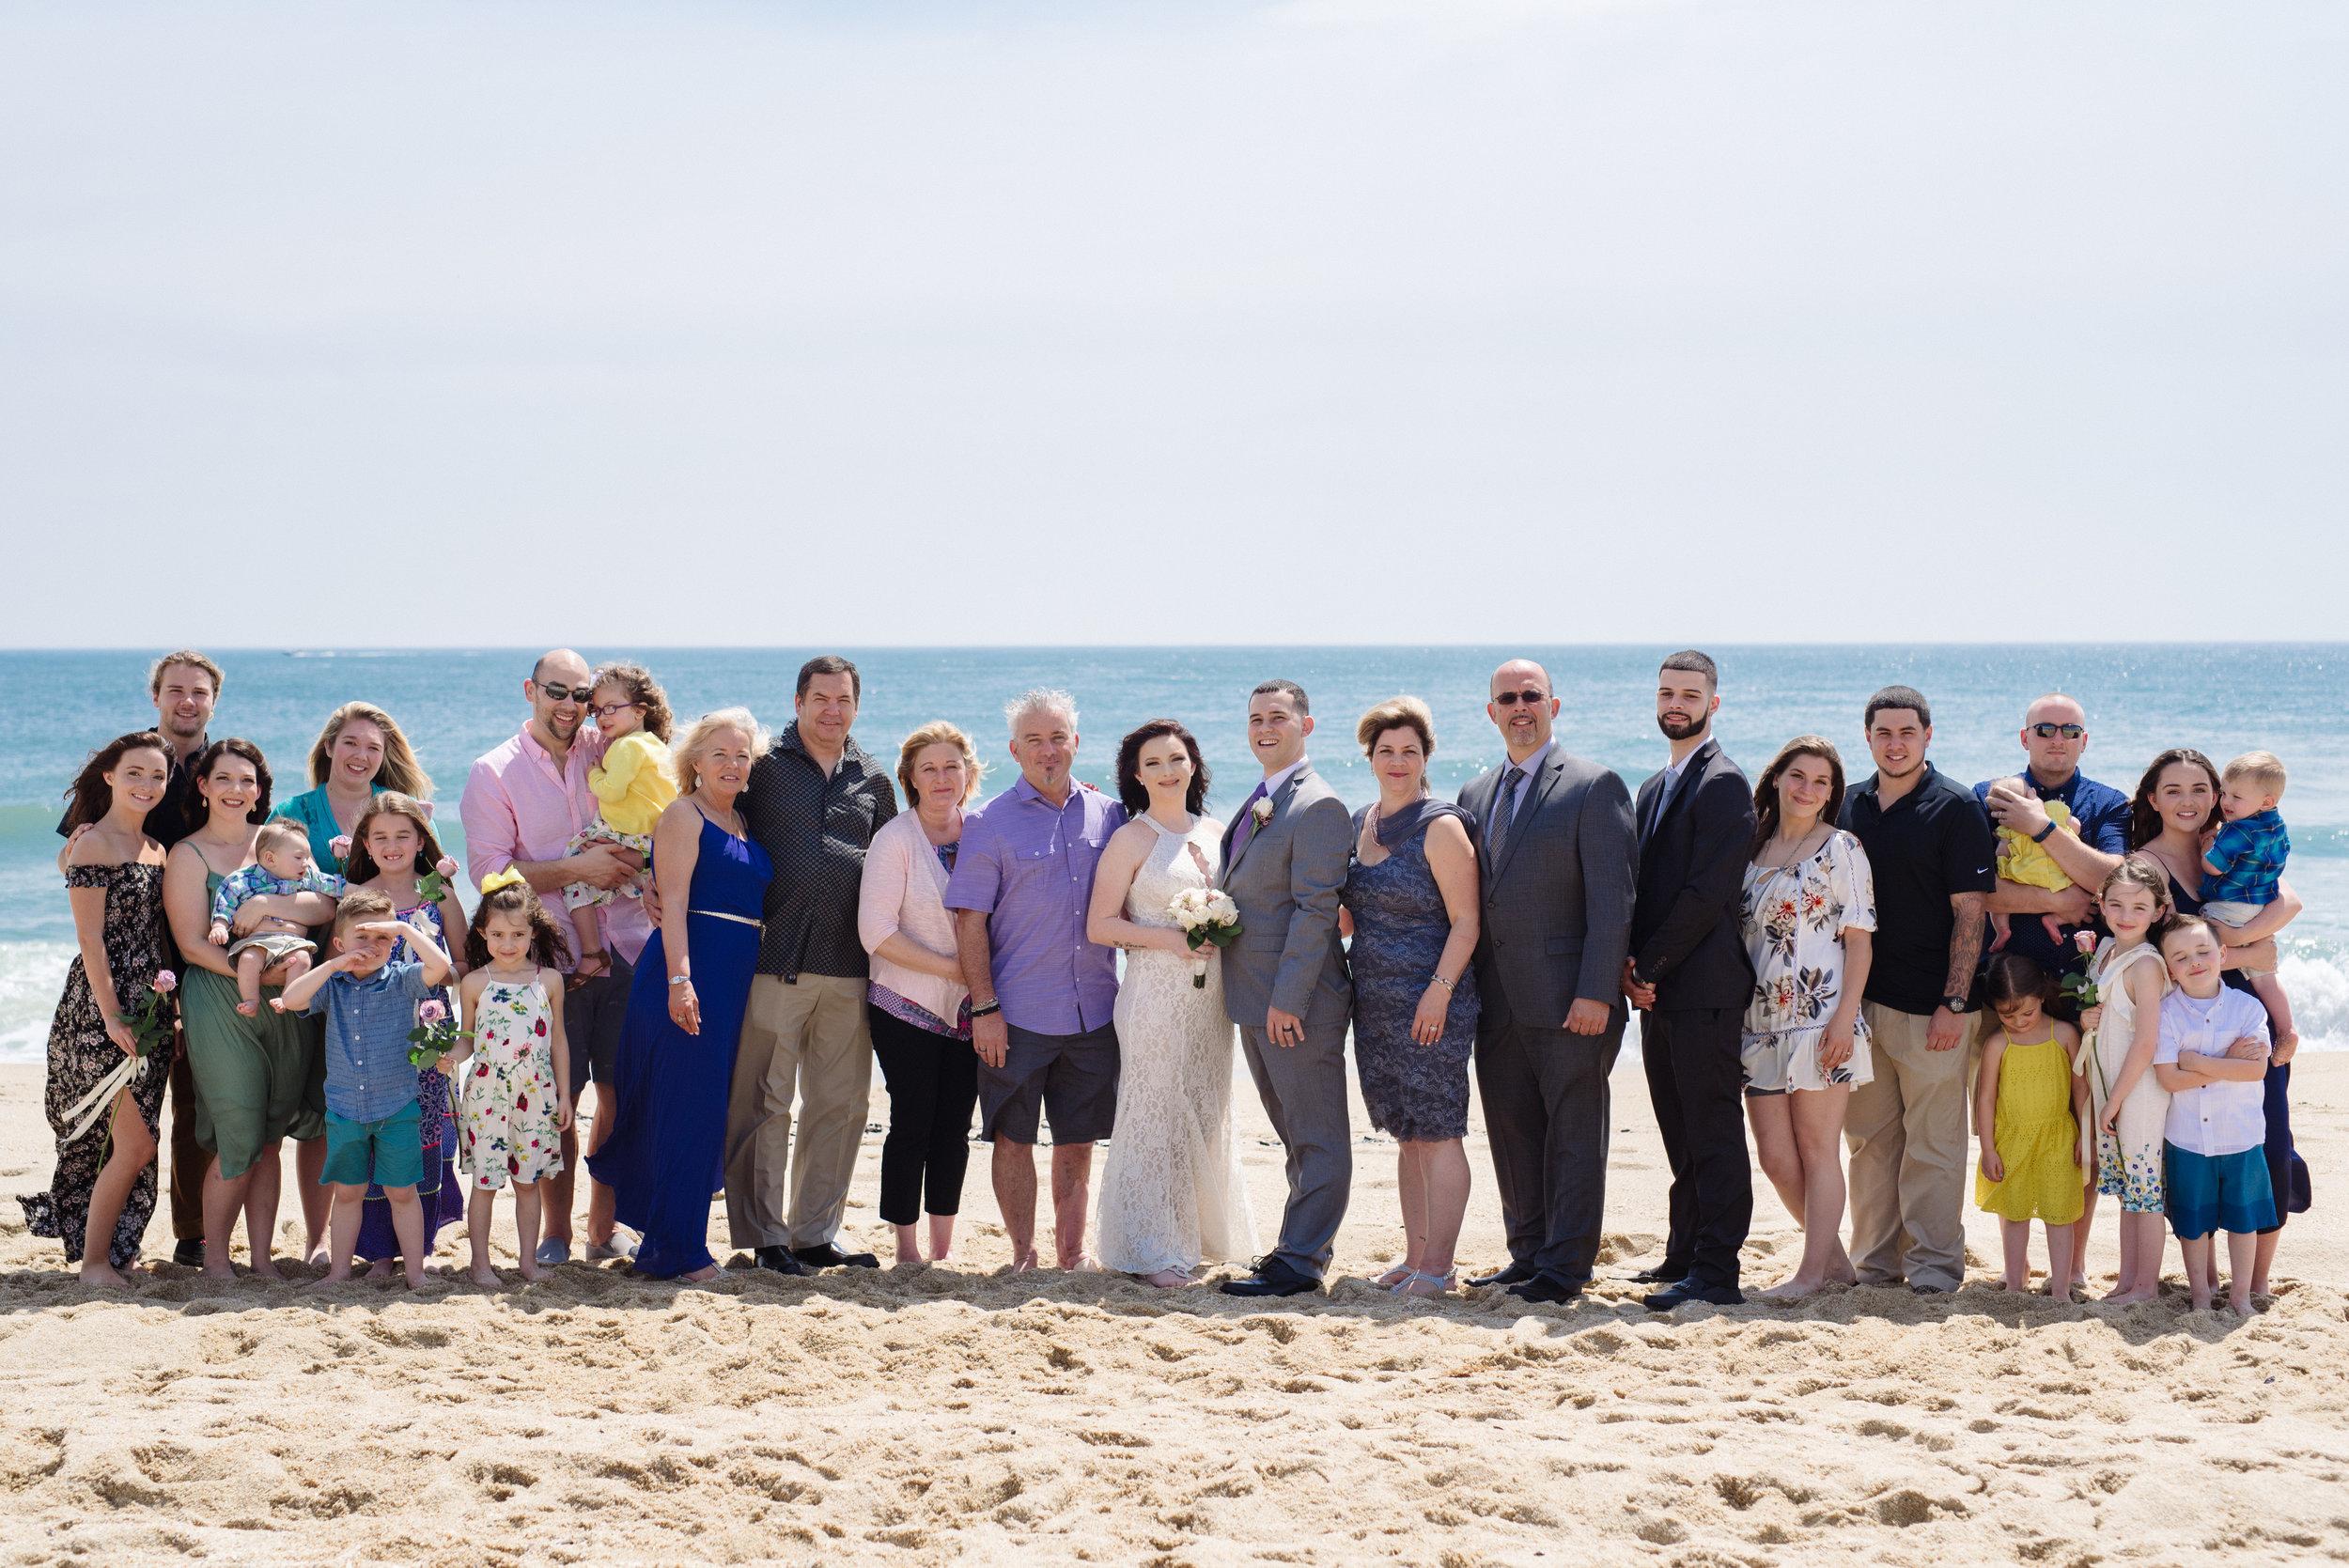 Caitlyn+Anthony- Belmar Beach Elopement- New Jersey Weddings- Olivia Christina Photo-56.JPG